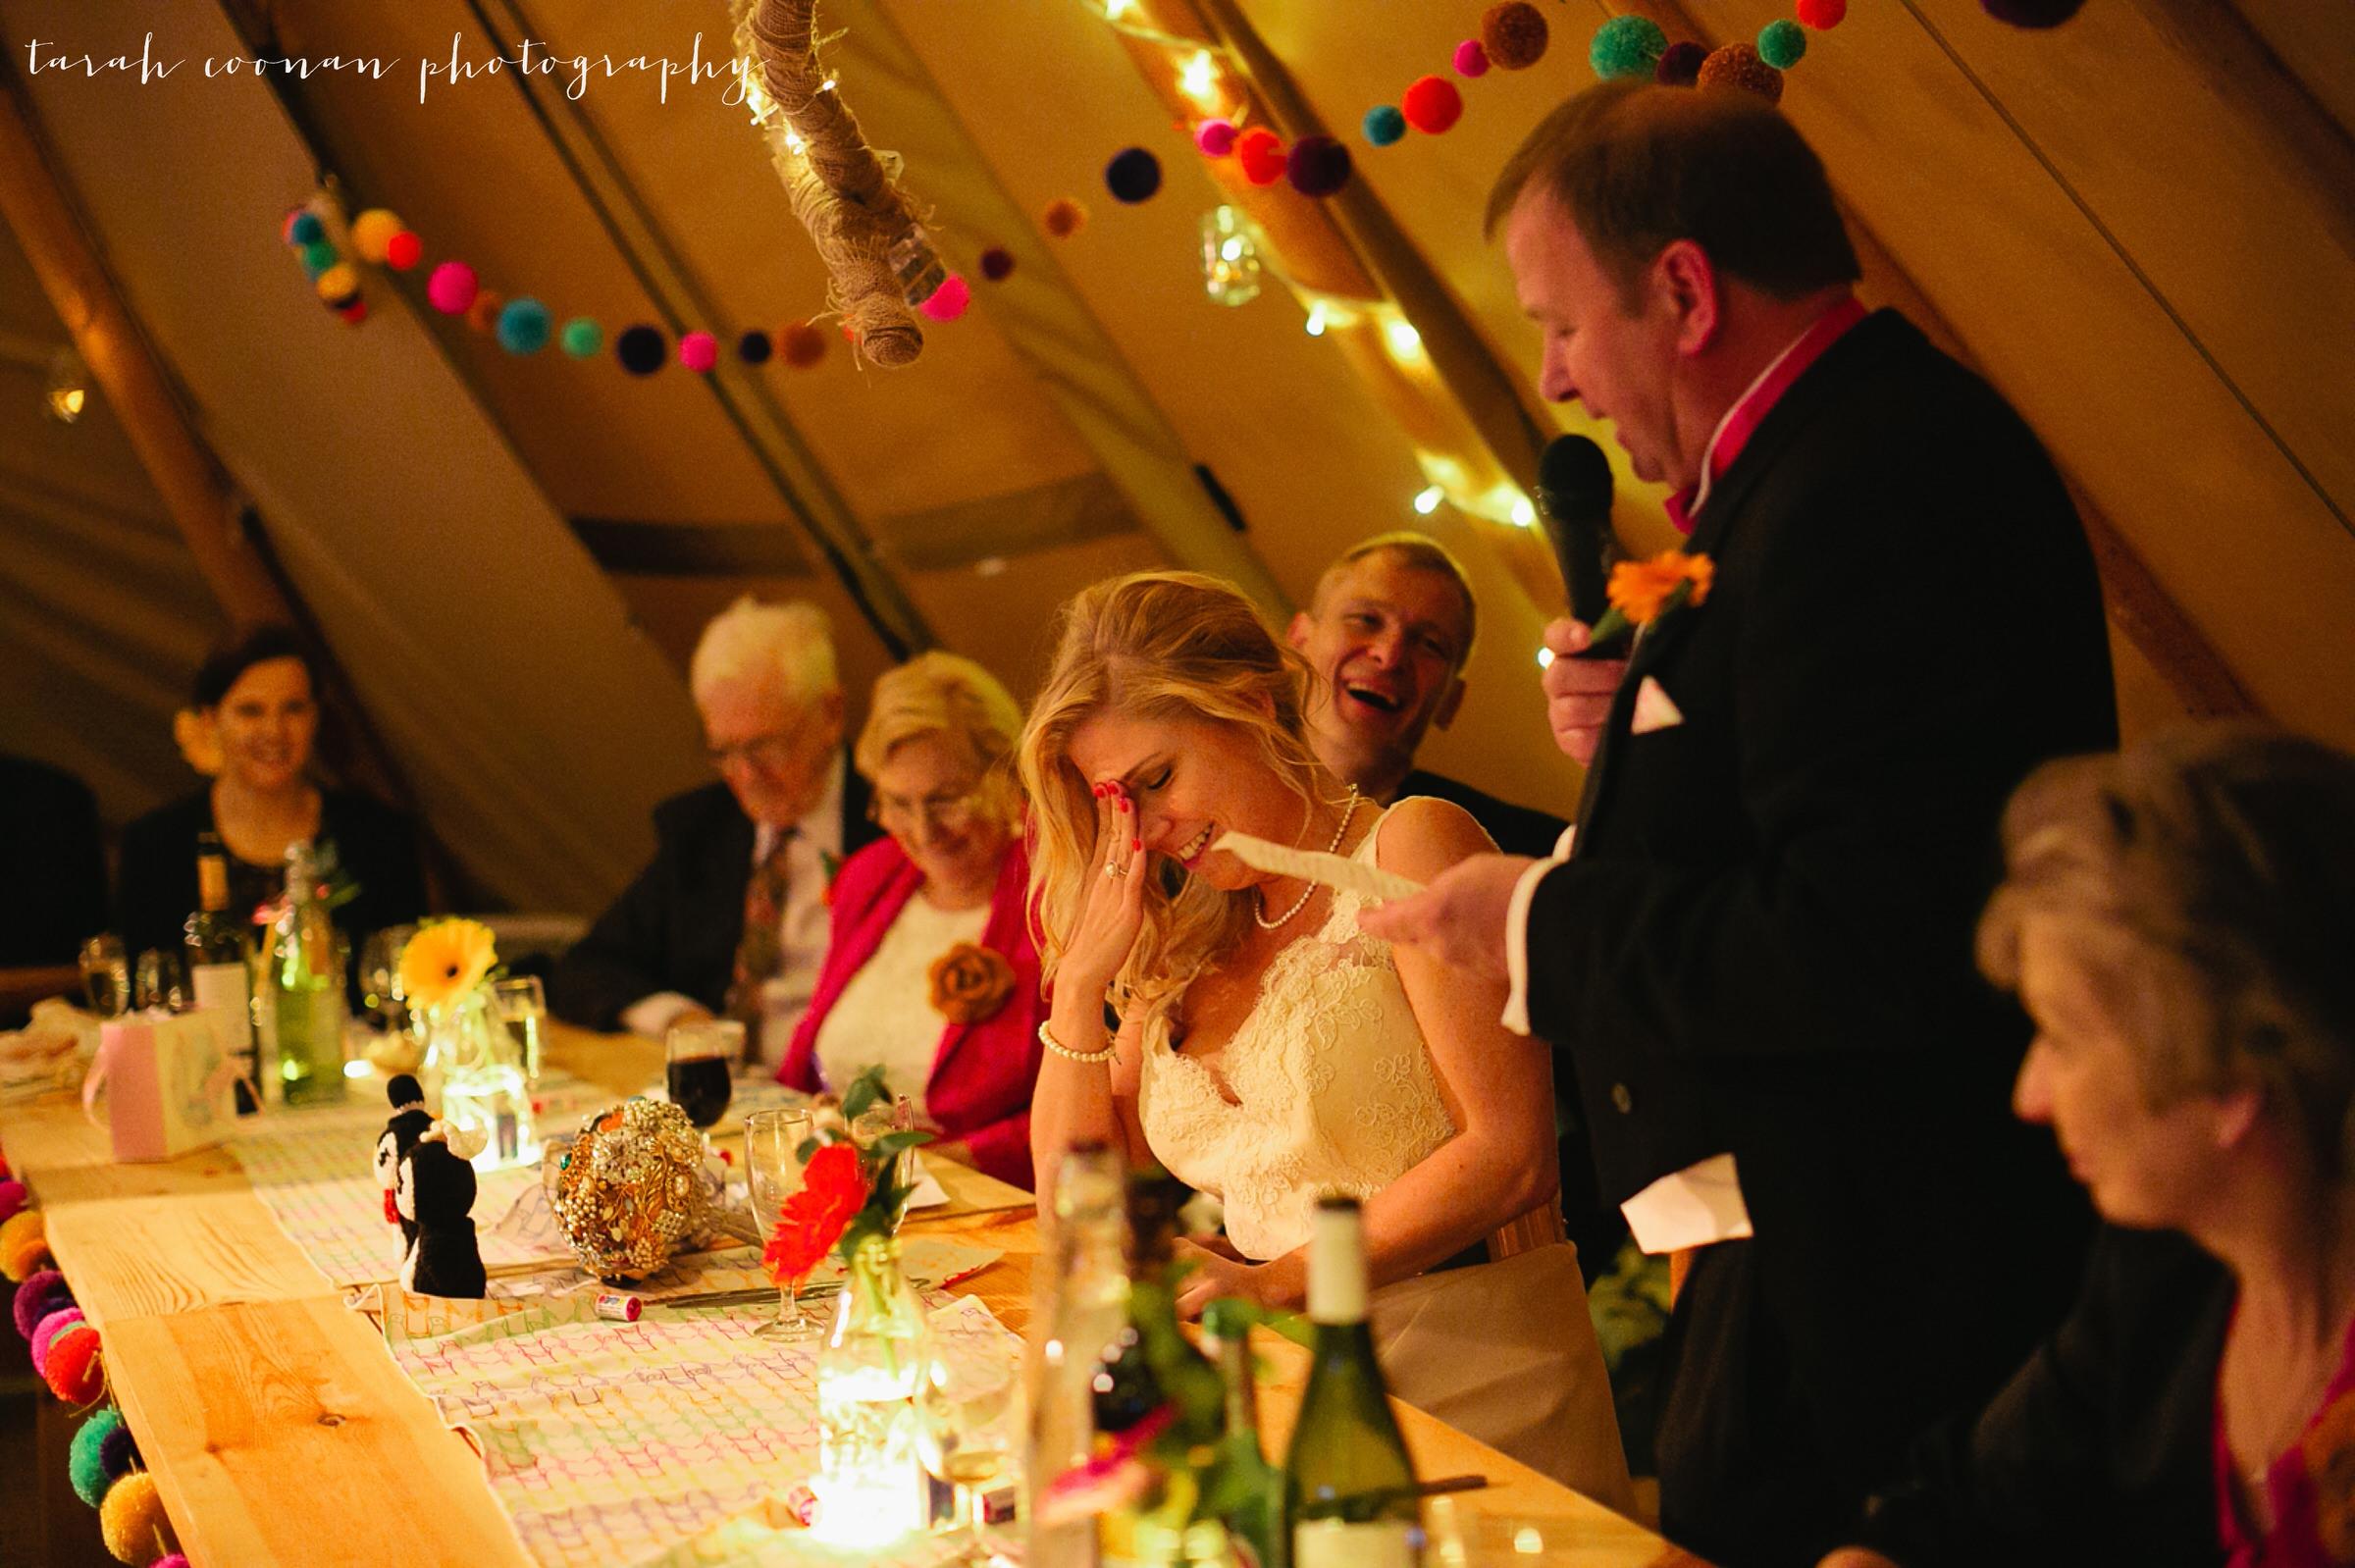 brighton-wedding-photographer86